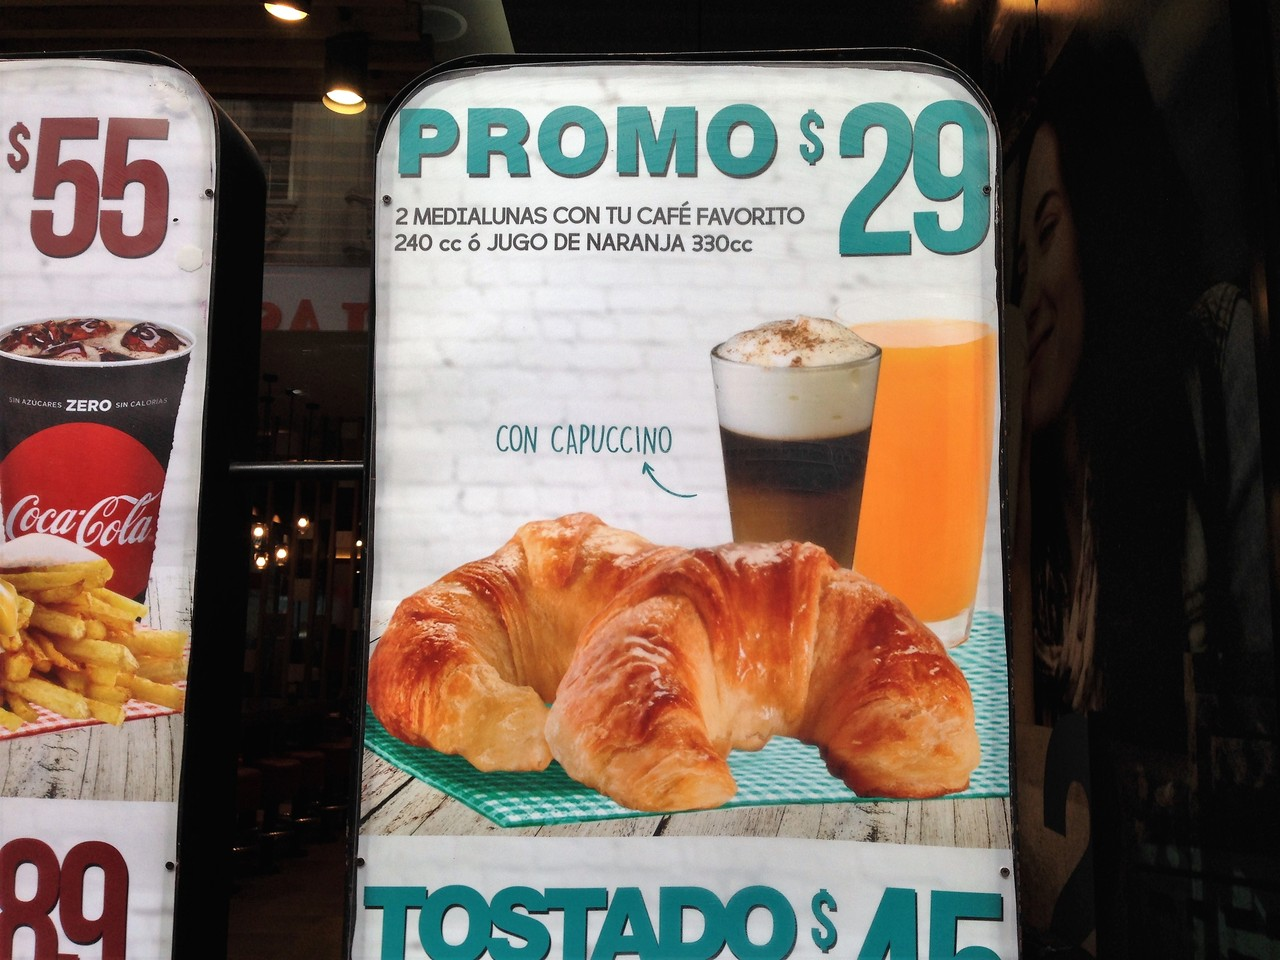 Ciel オフィシャルブログ 月に一度の世界スパ&ホテル巡り  ブエノスアイレス最古のカフェ「トルトーニ」 アルゼンチンの朝食